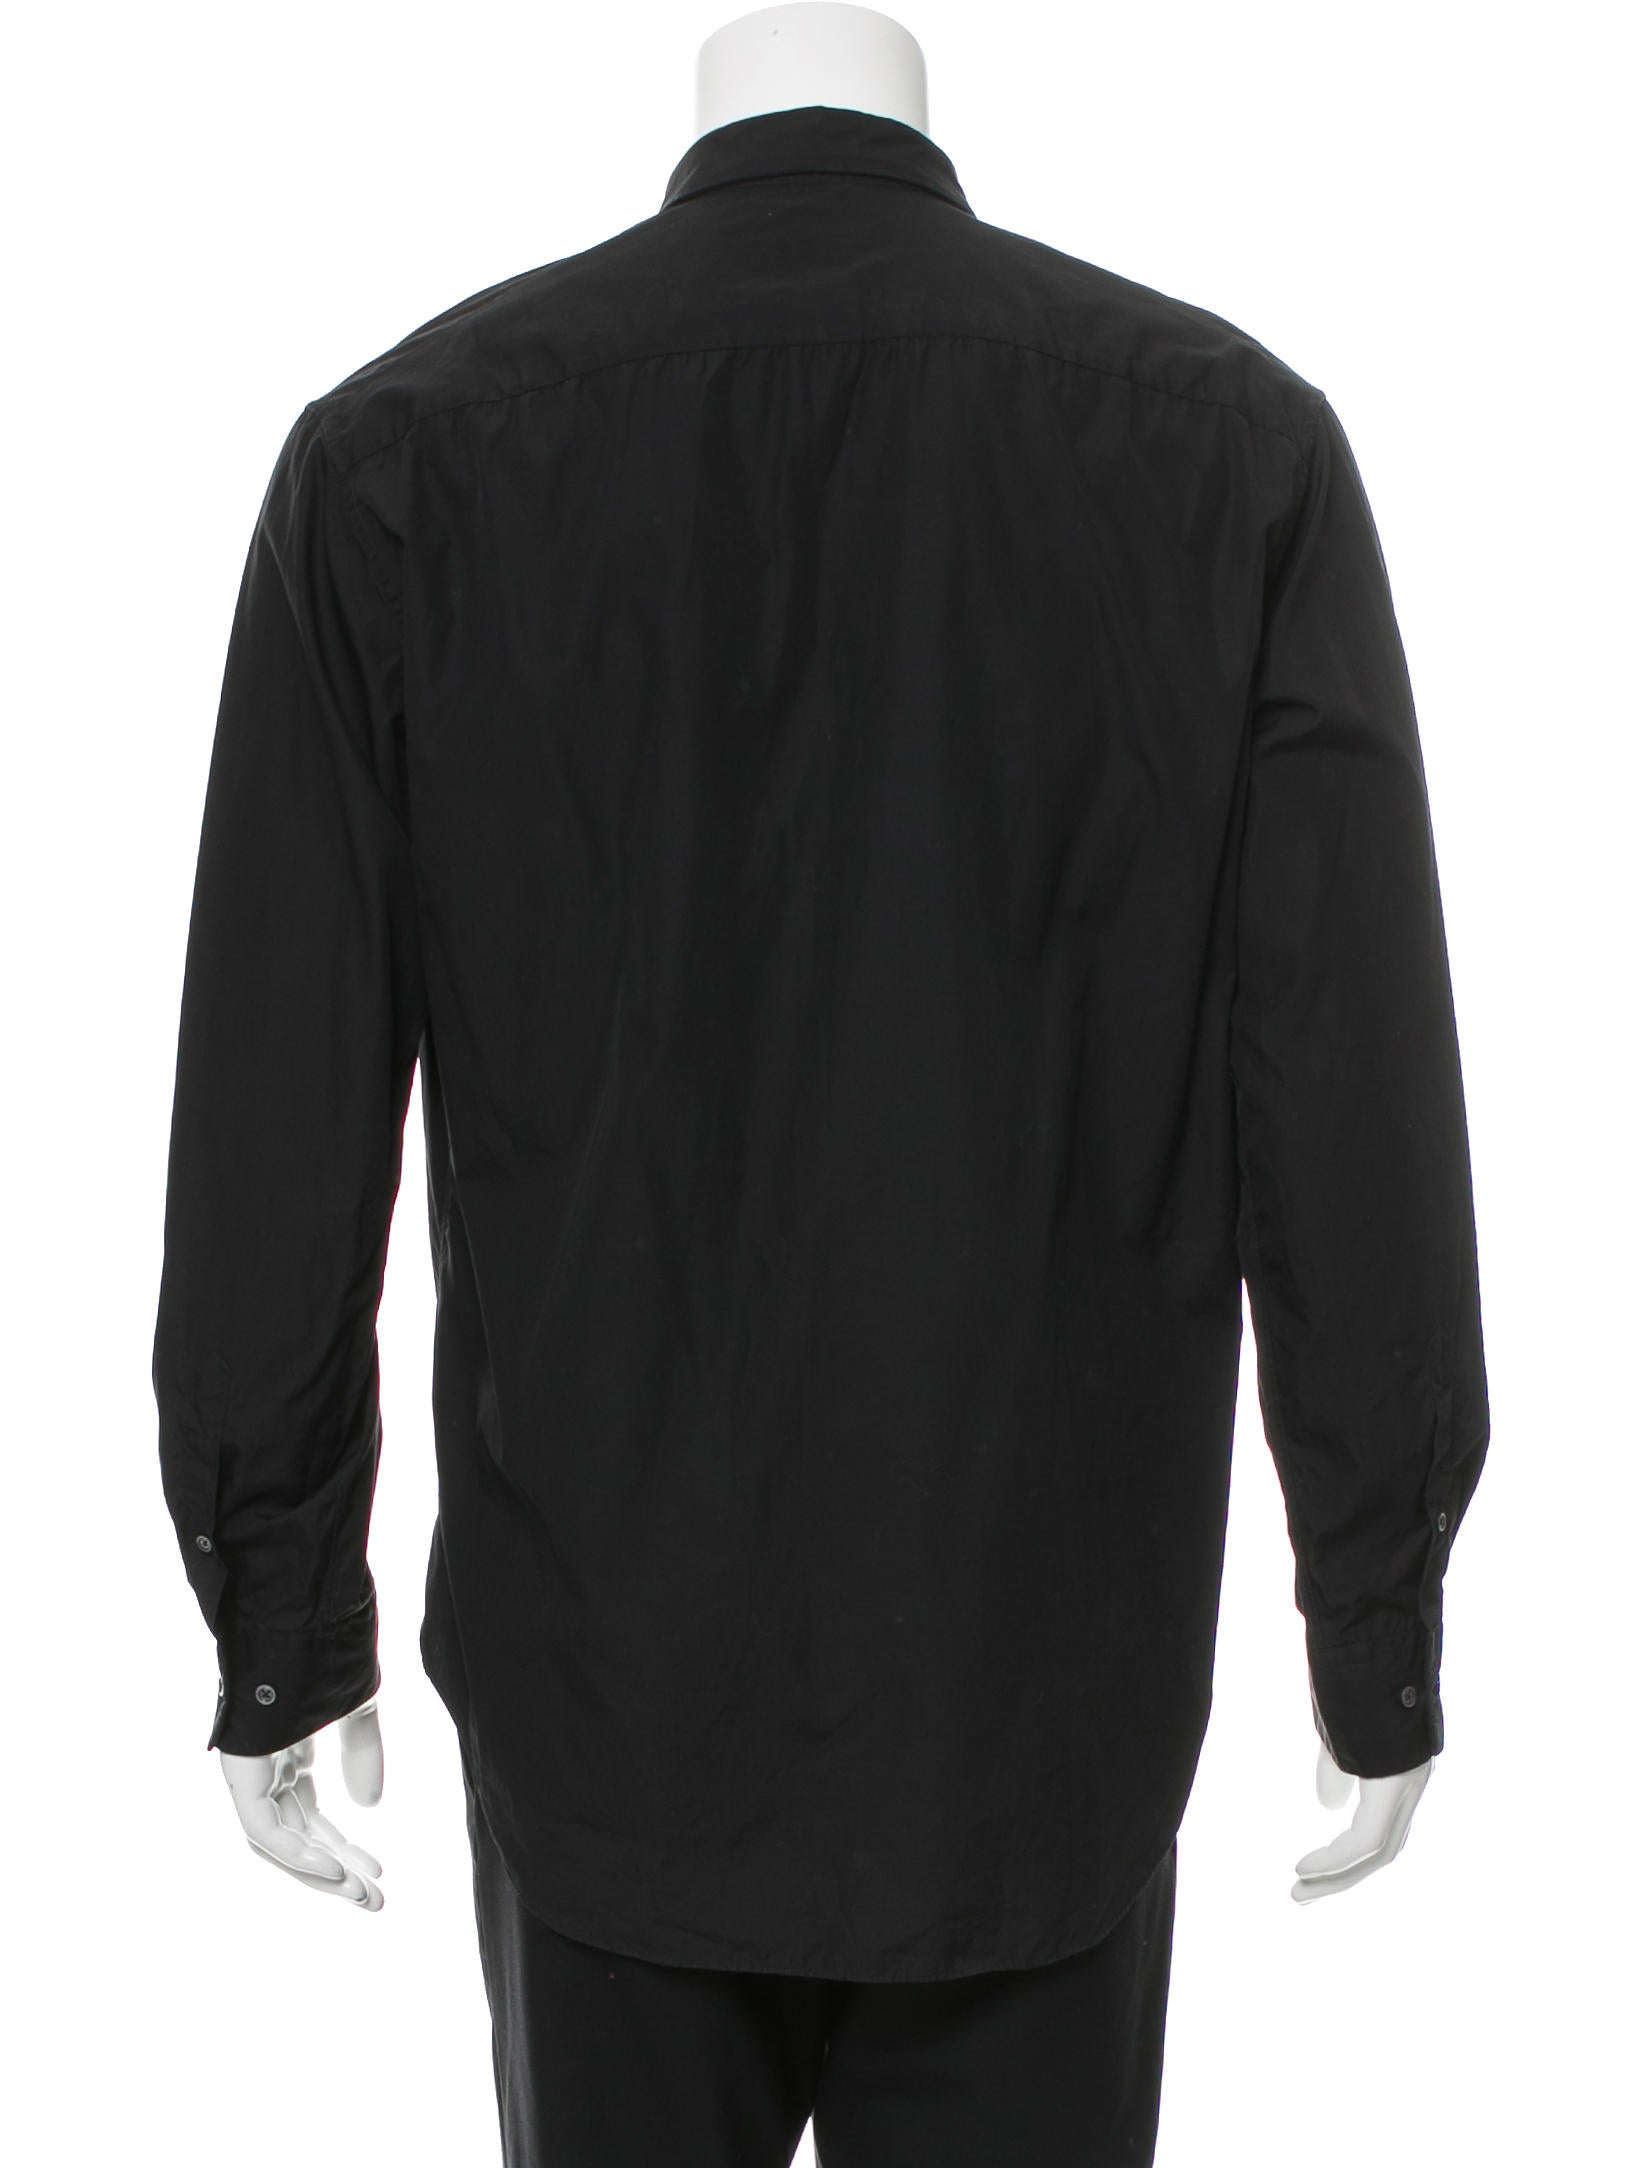 Jil sander woven button up shirt clothing jil37976 for Jil sander mens shirt